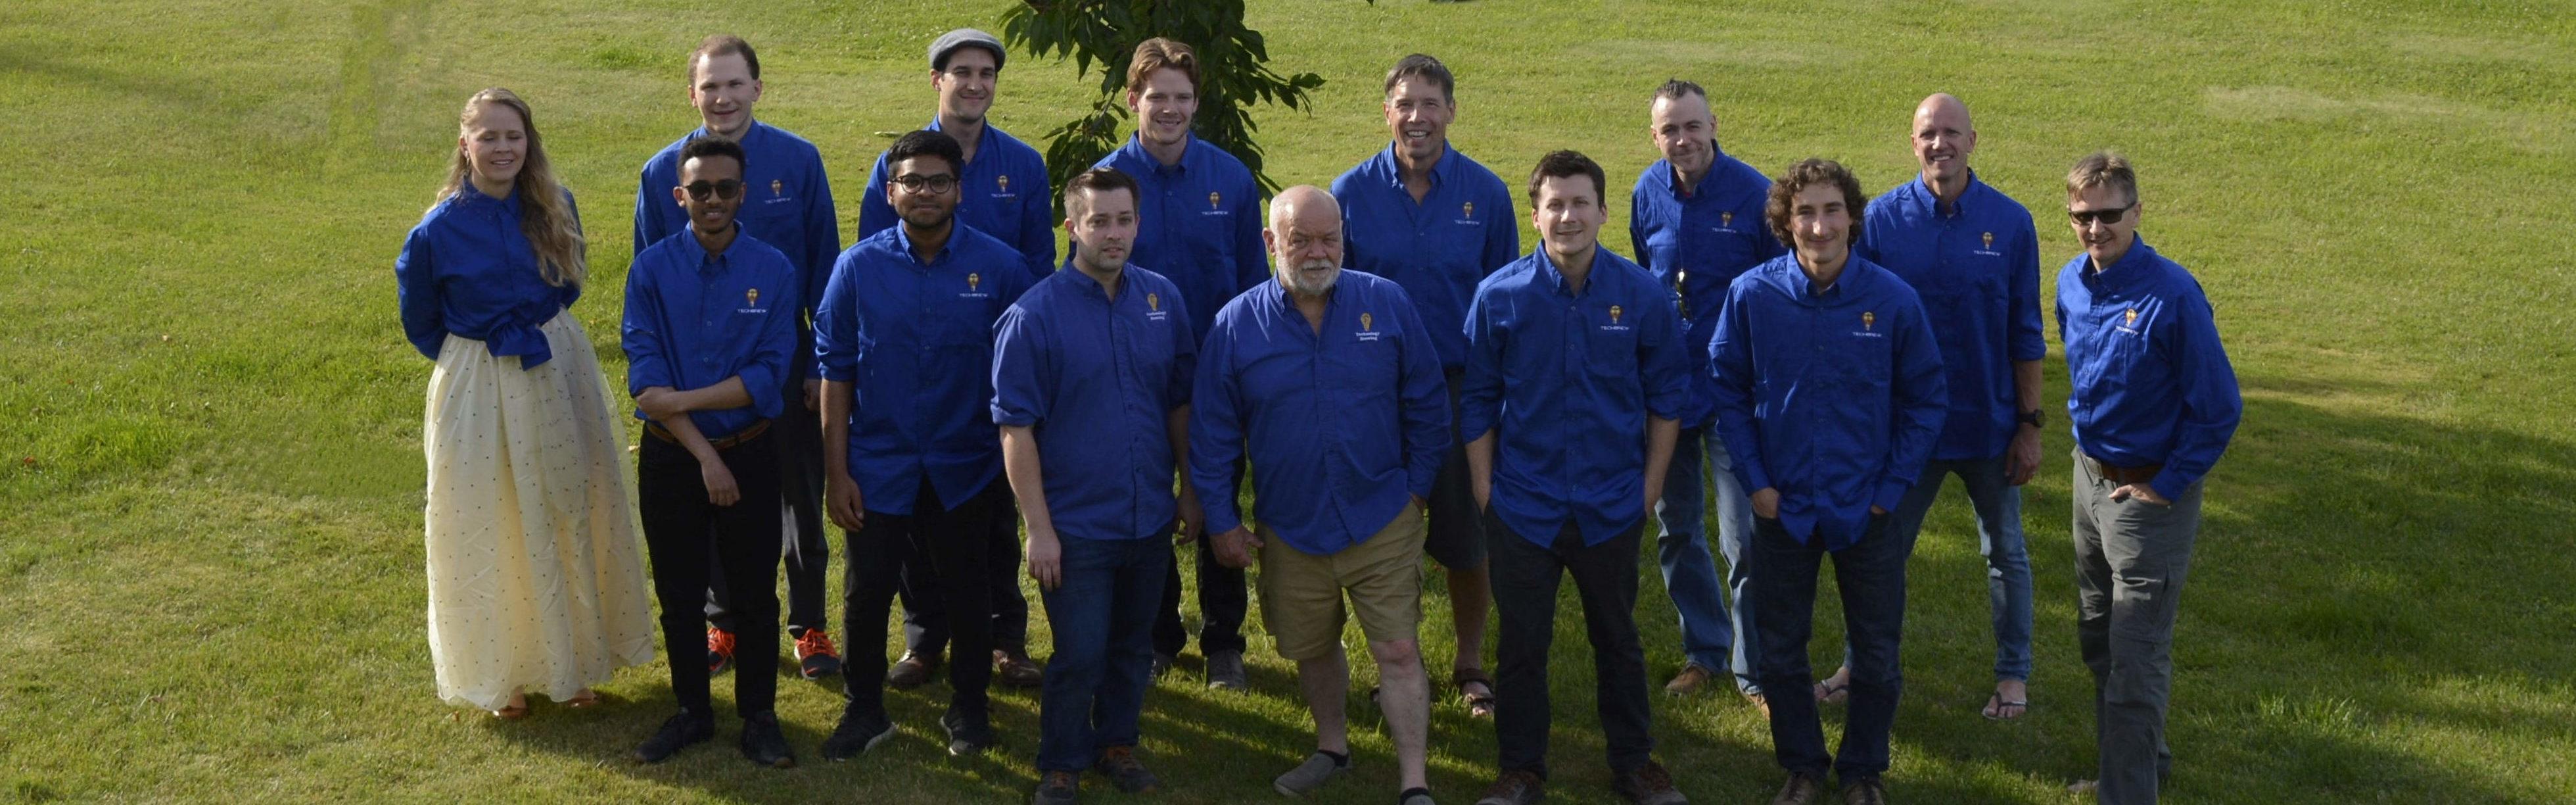 Photo of TechBrew Team 2020